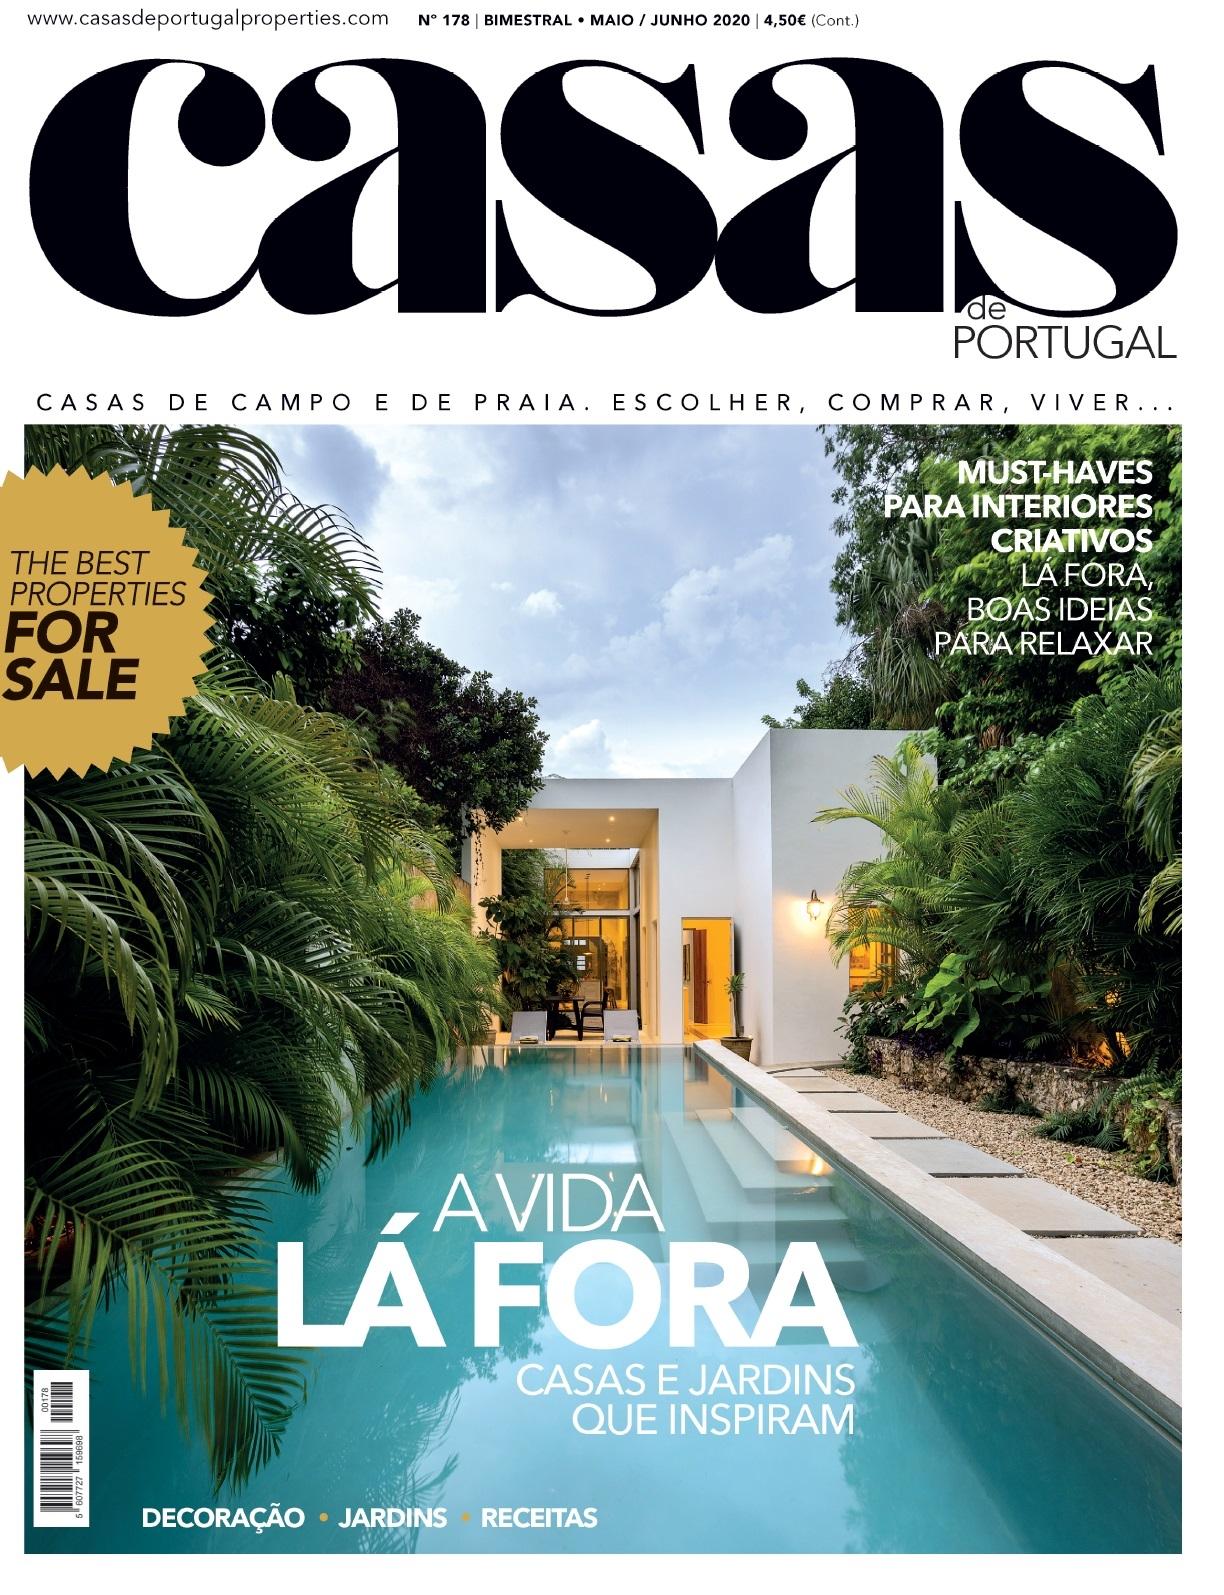 Casas-de-Portugal-178